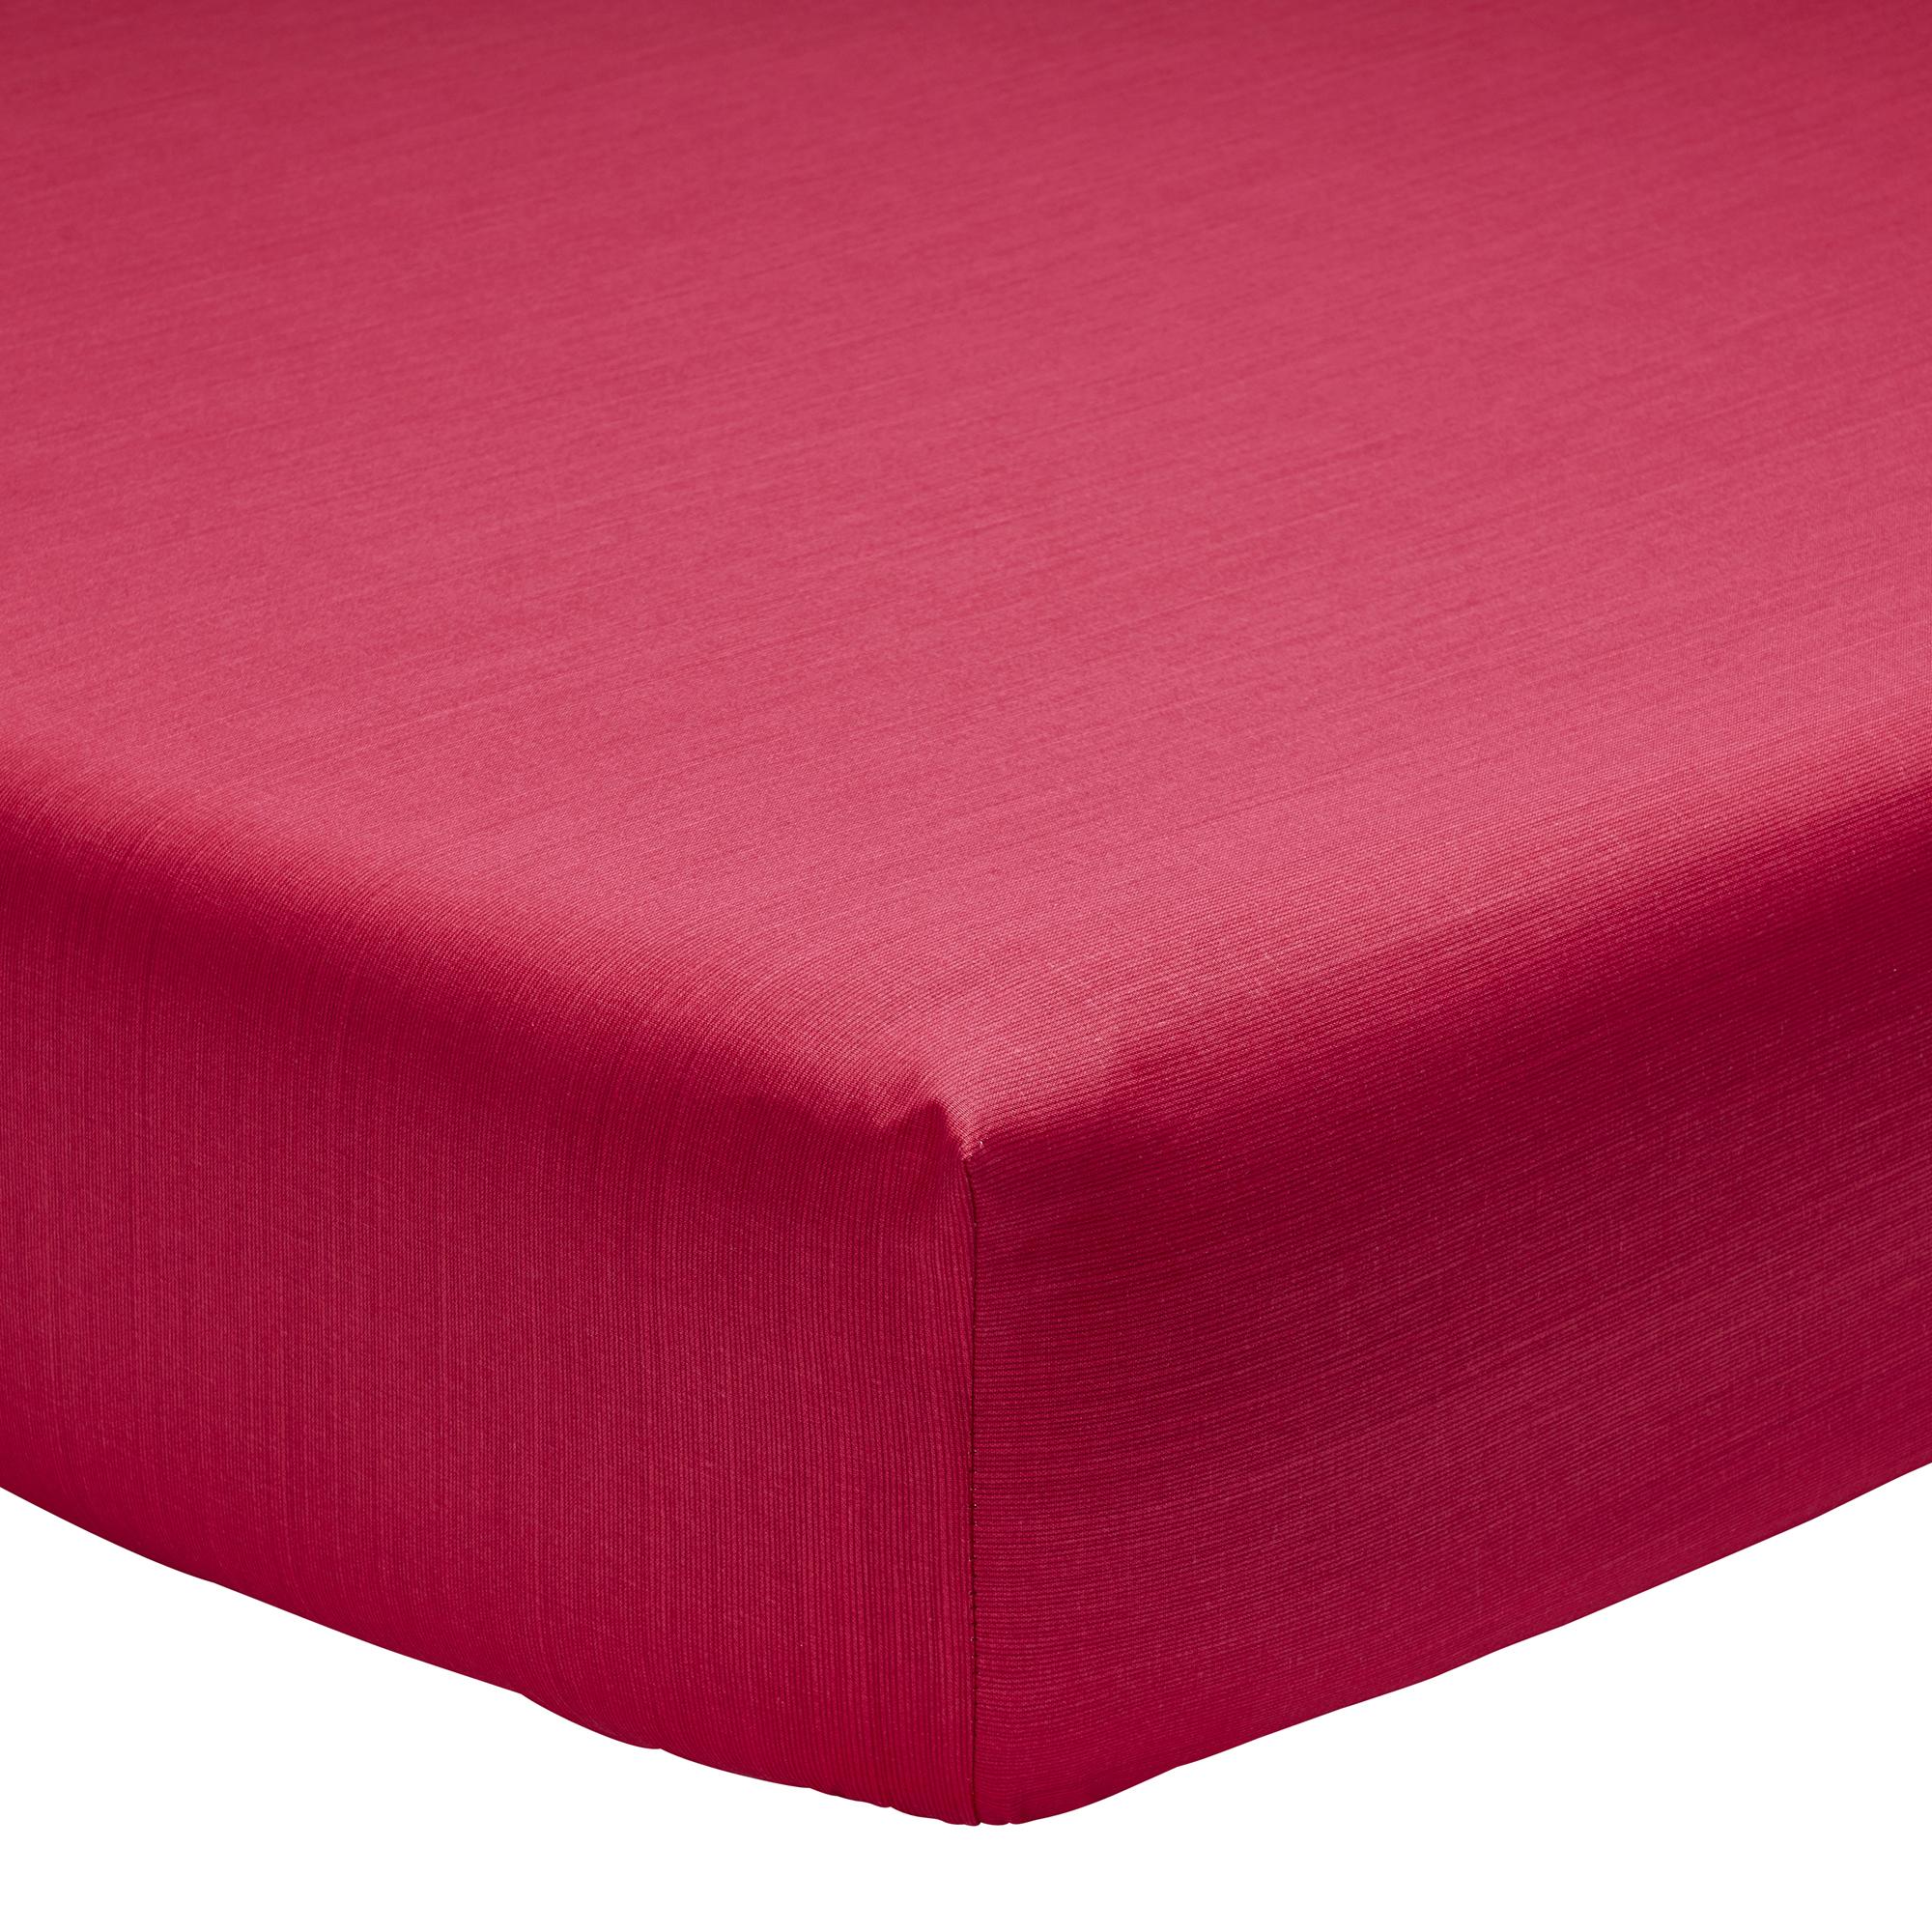 Drap housse fines rayures en bambou rouge 140 x 190